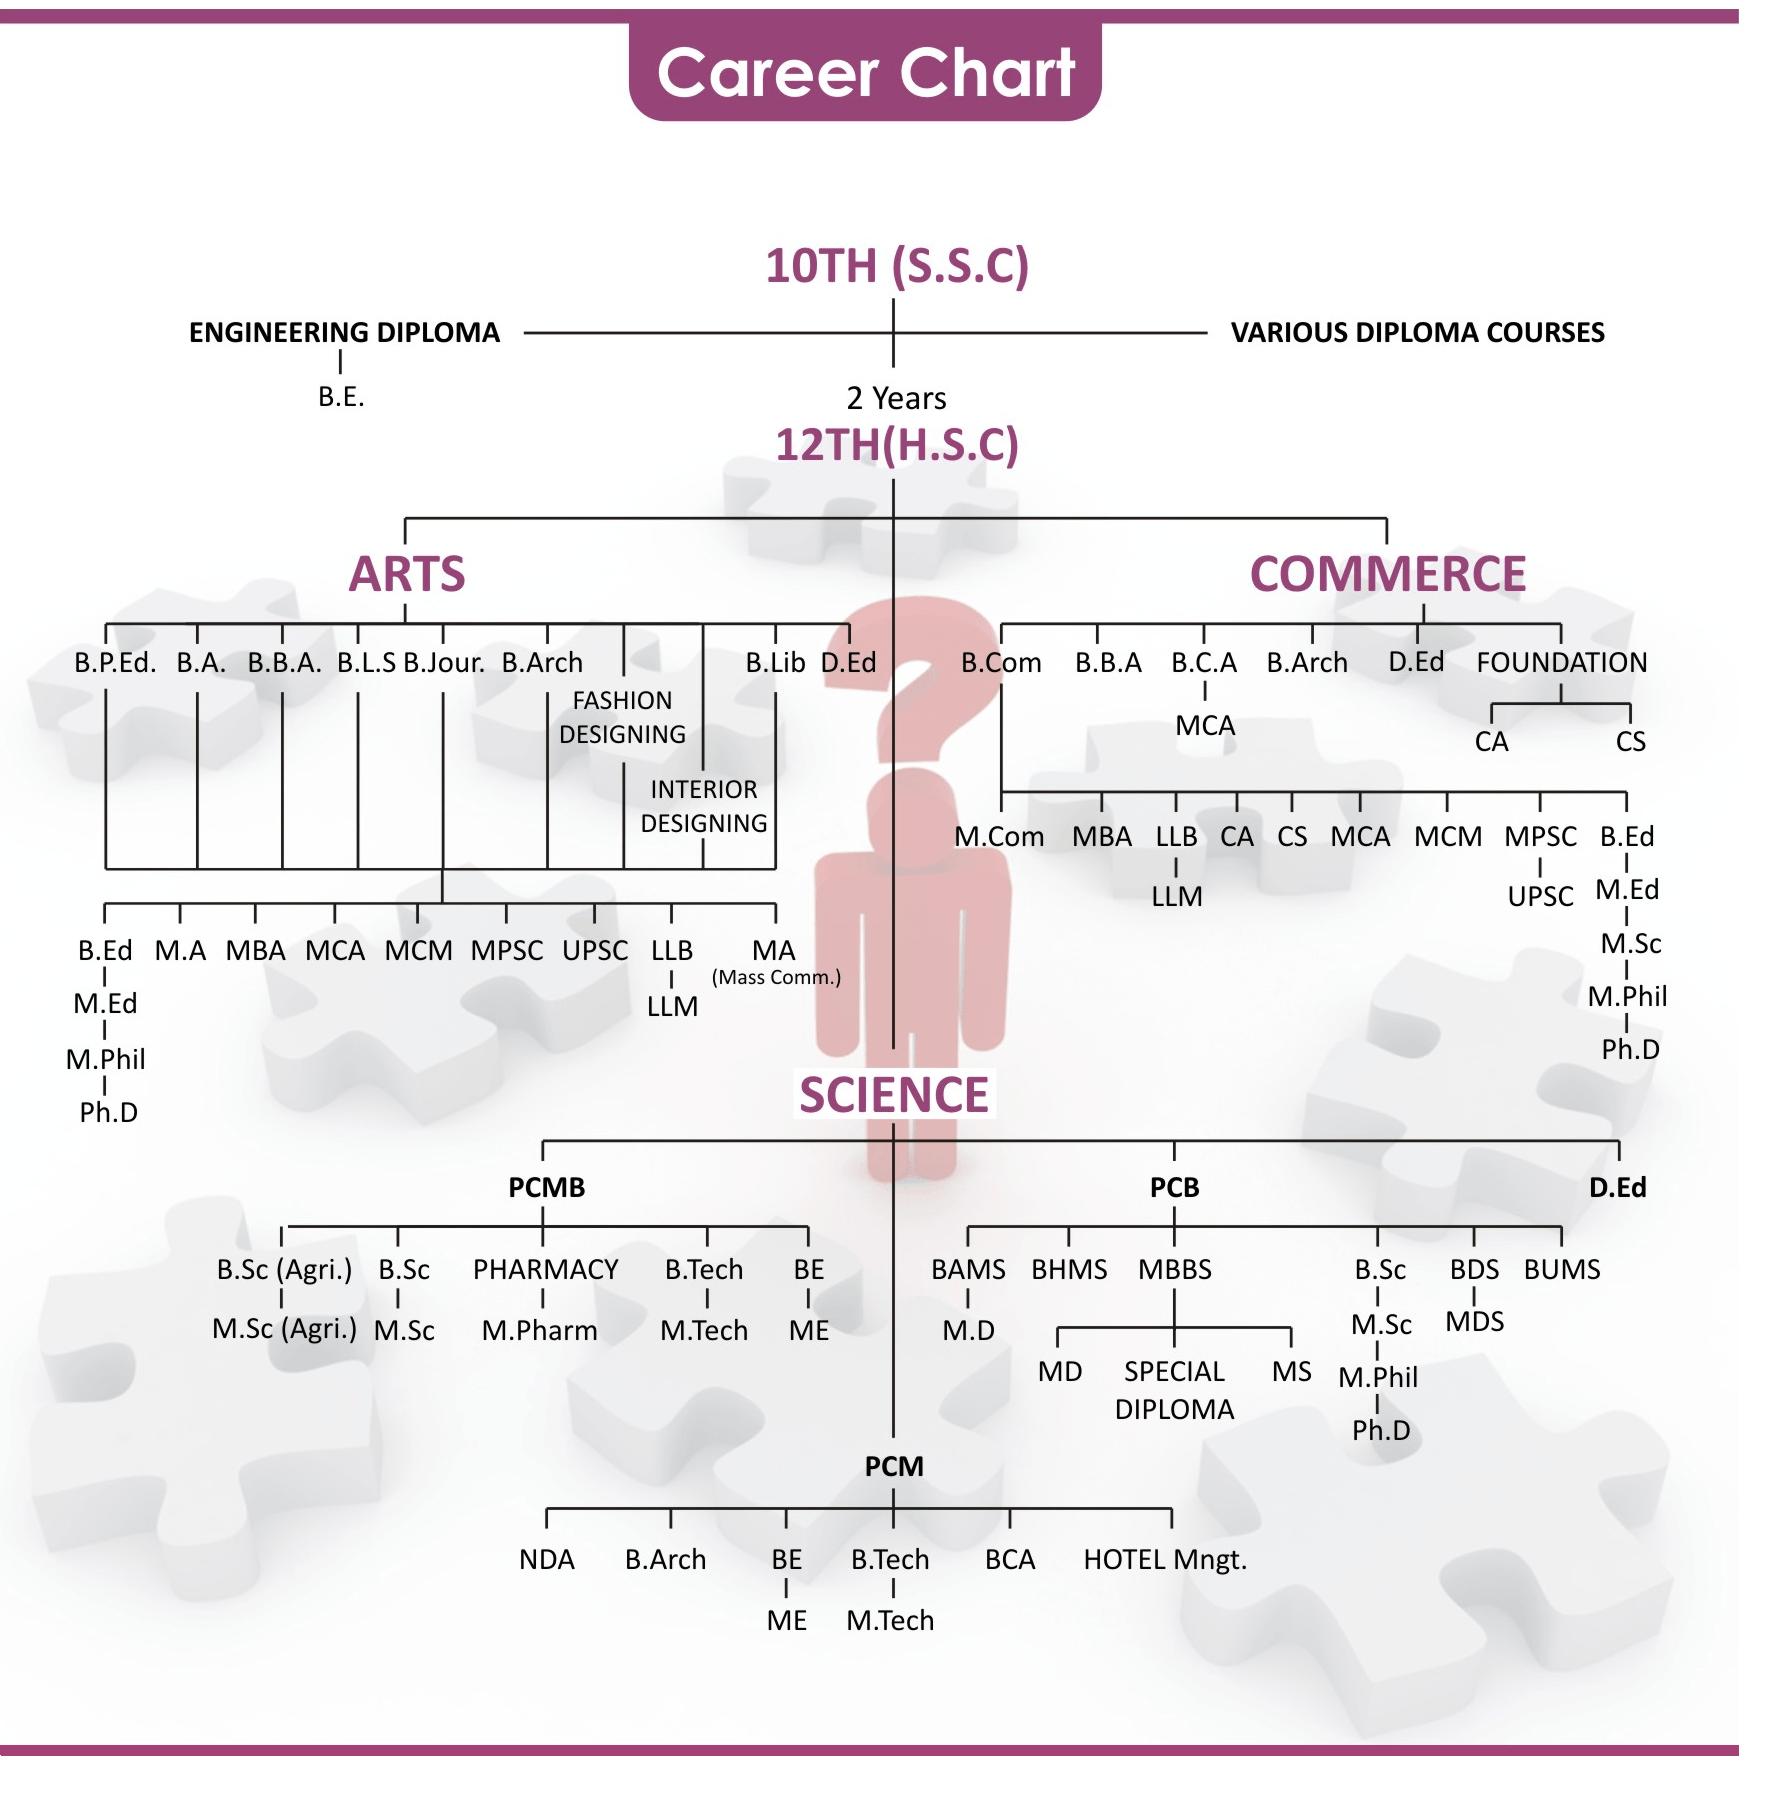 Best carrier options after graduation